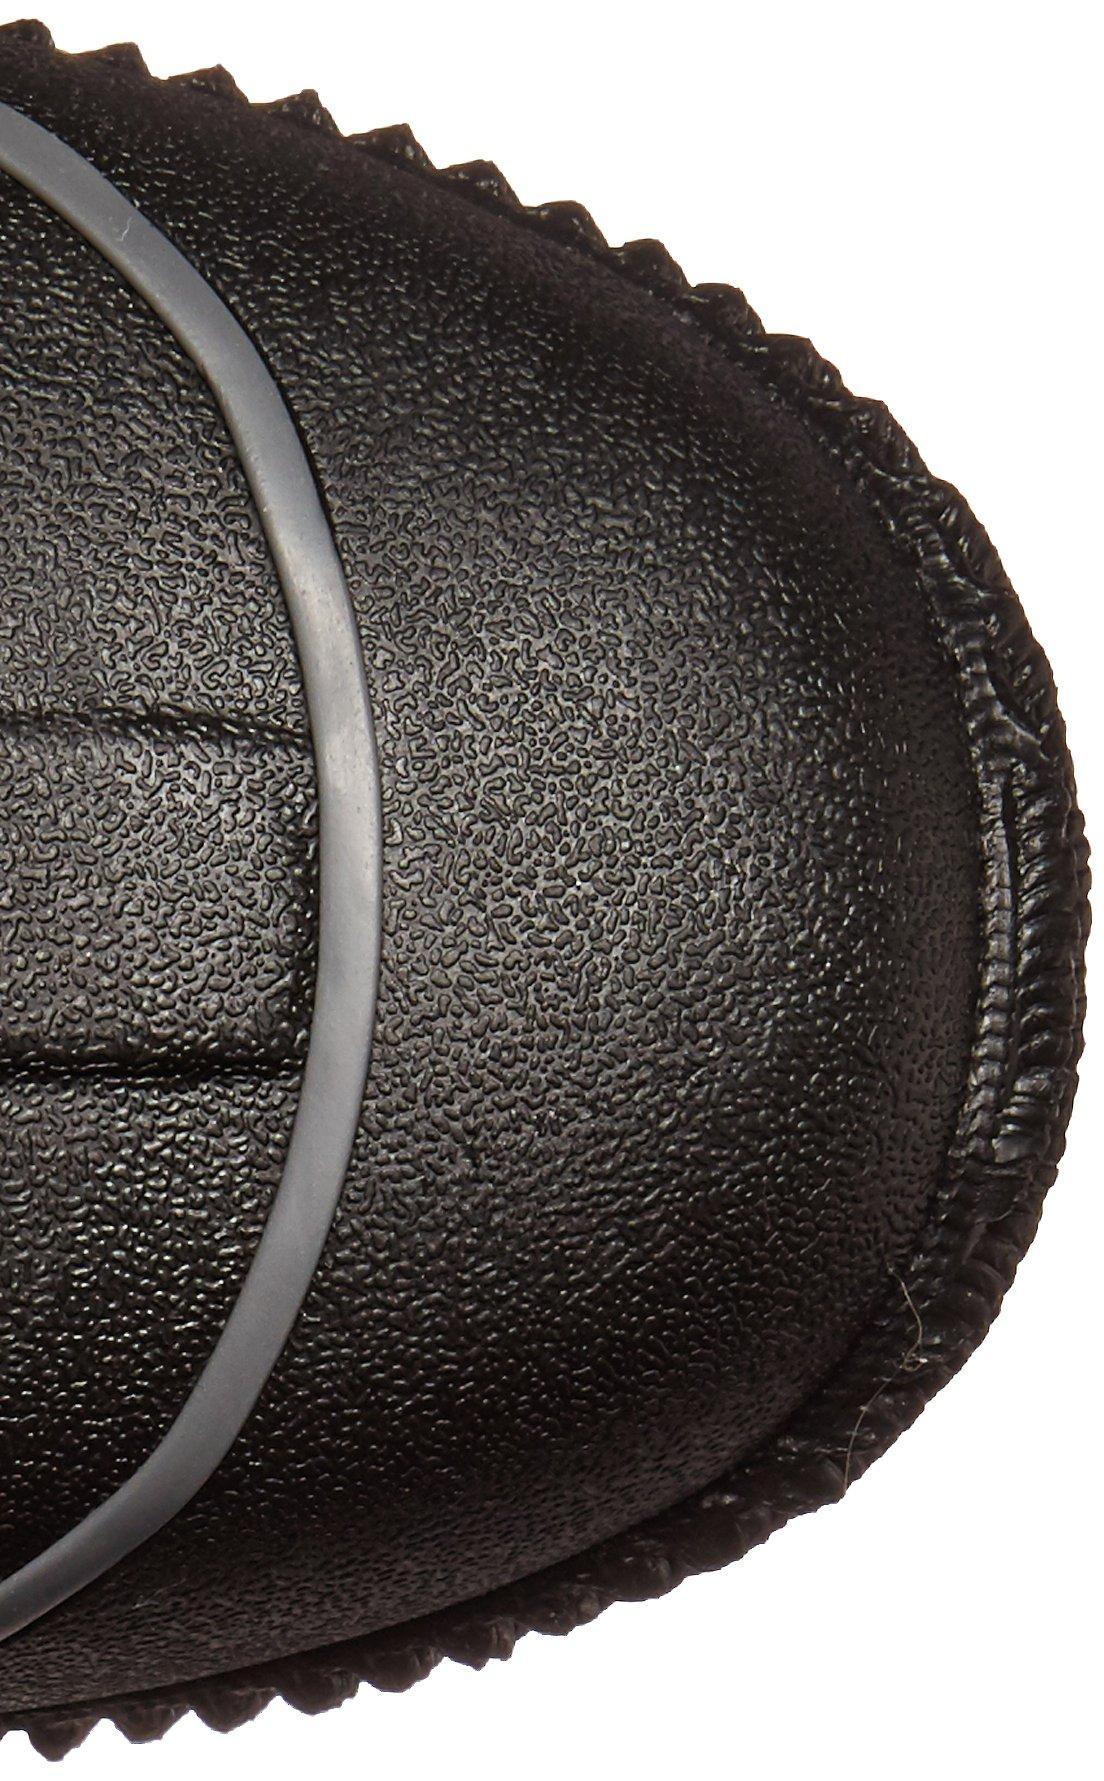 Muck Hale Multi-Season Women's Rubber Boots by Muck Boot (Image #8)